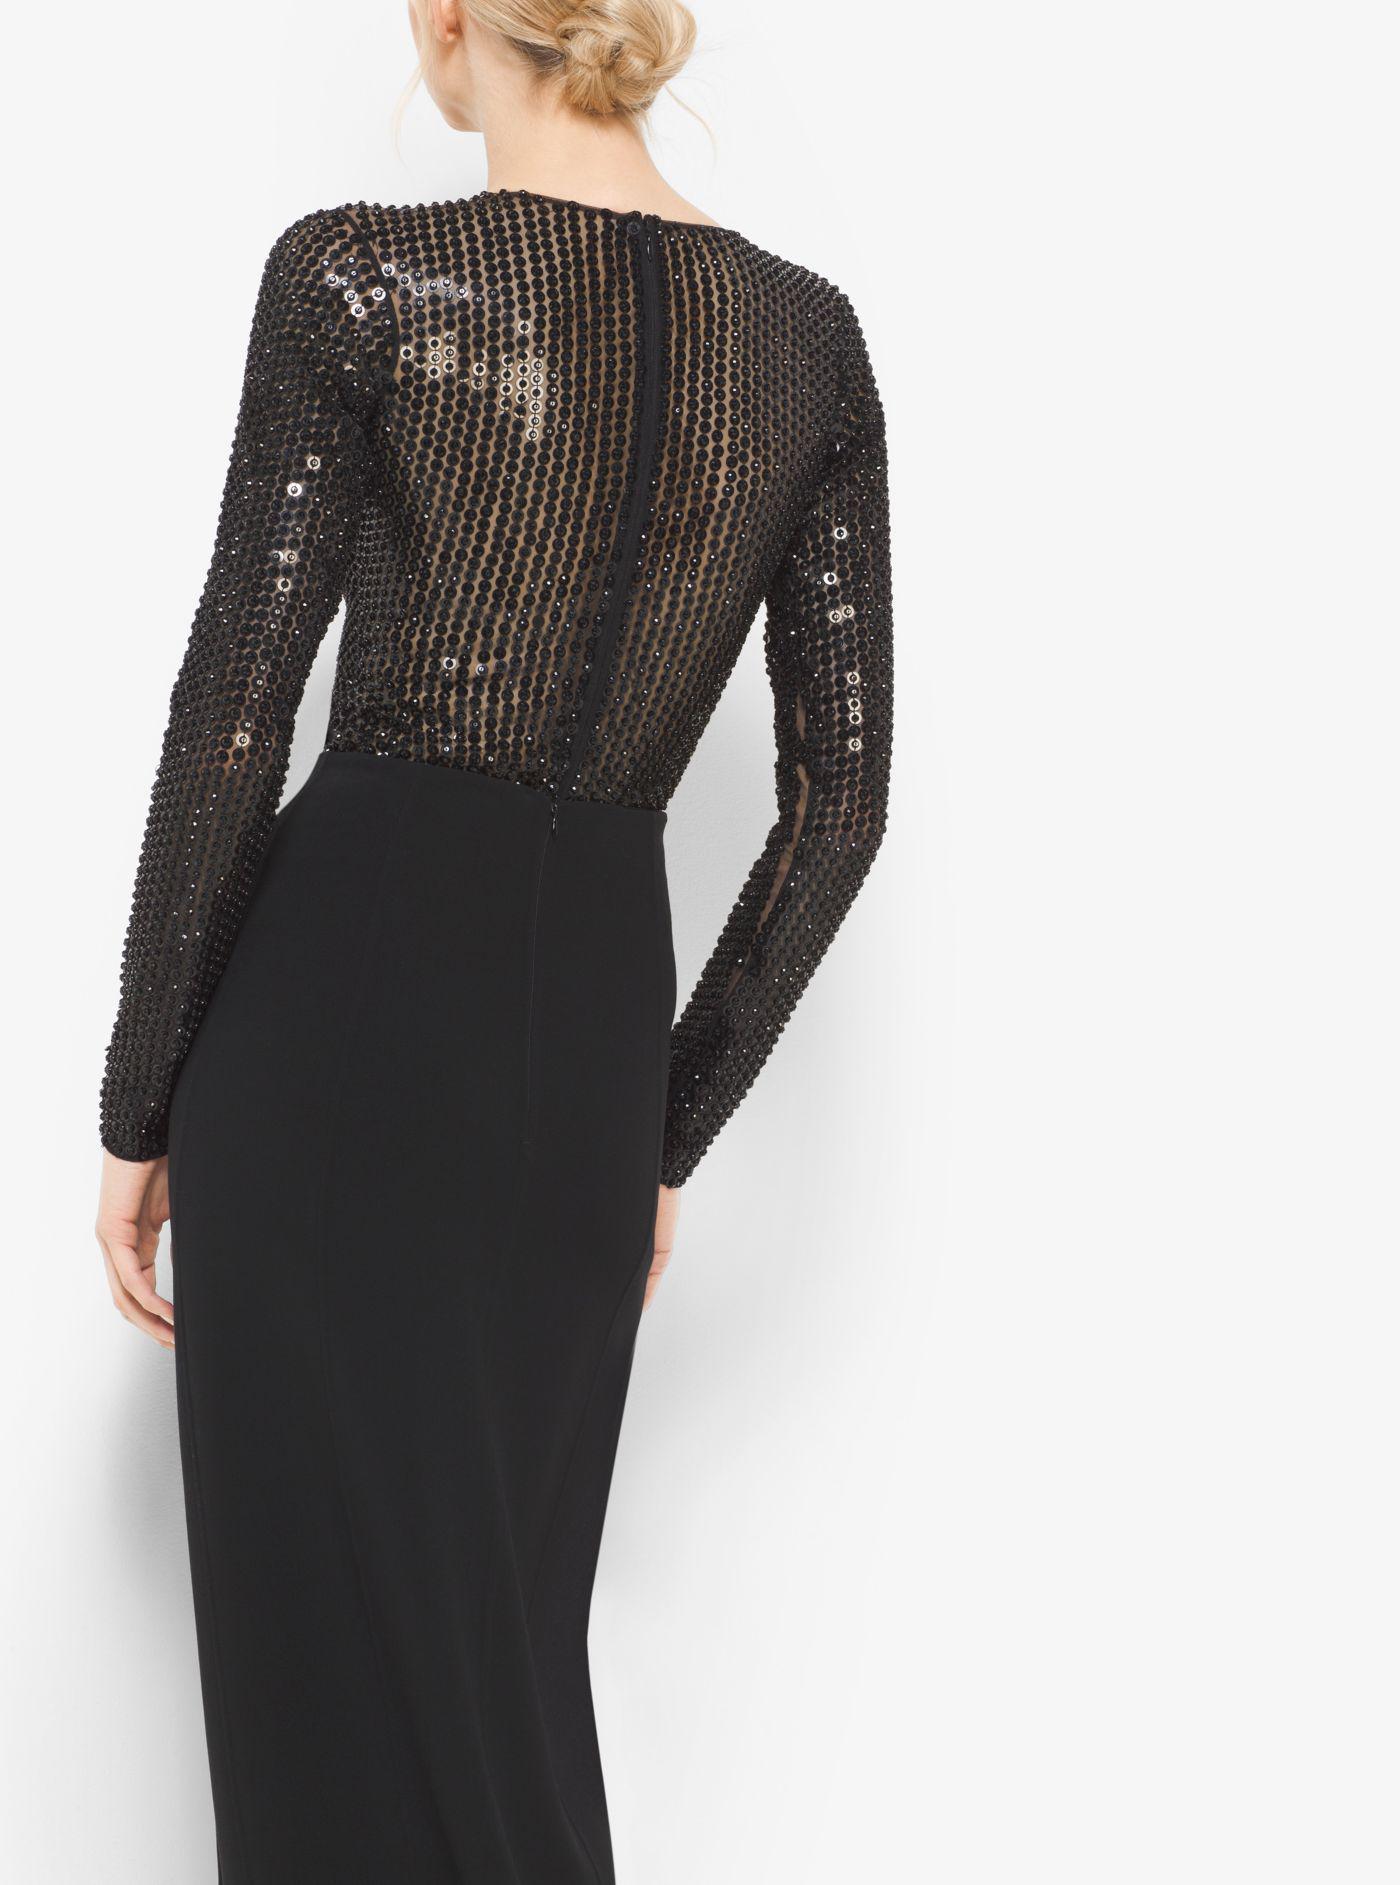 3665af468e Lyst - Michael Kors Sequin-embroidered Stretch-tulle Bodysuit in Black